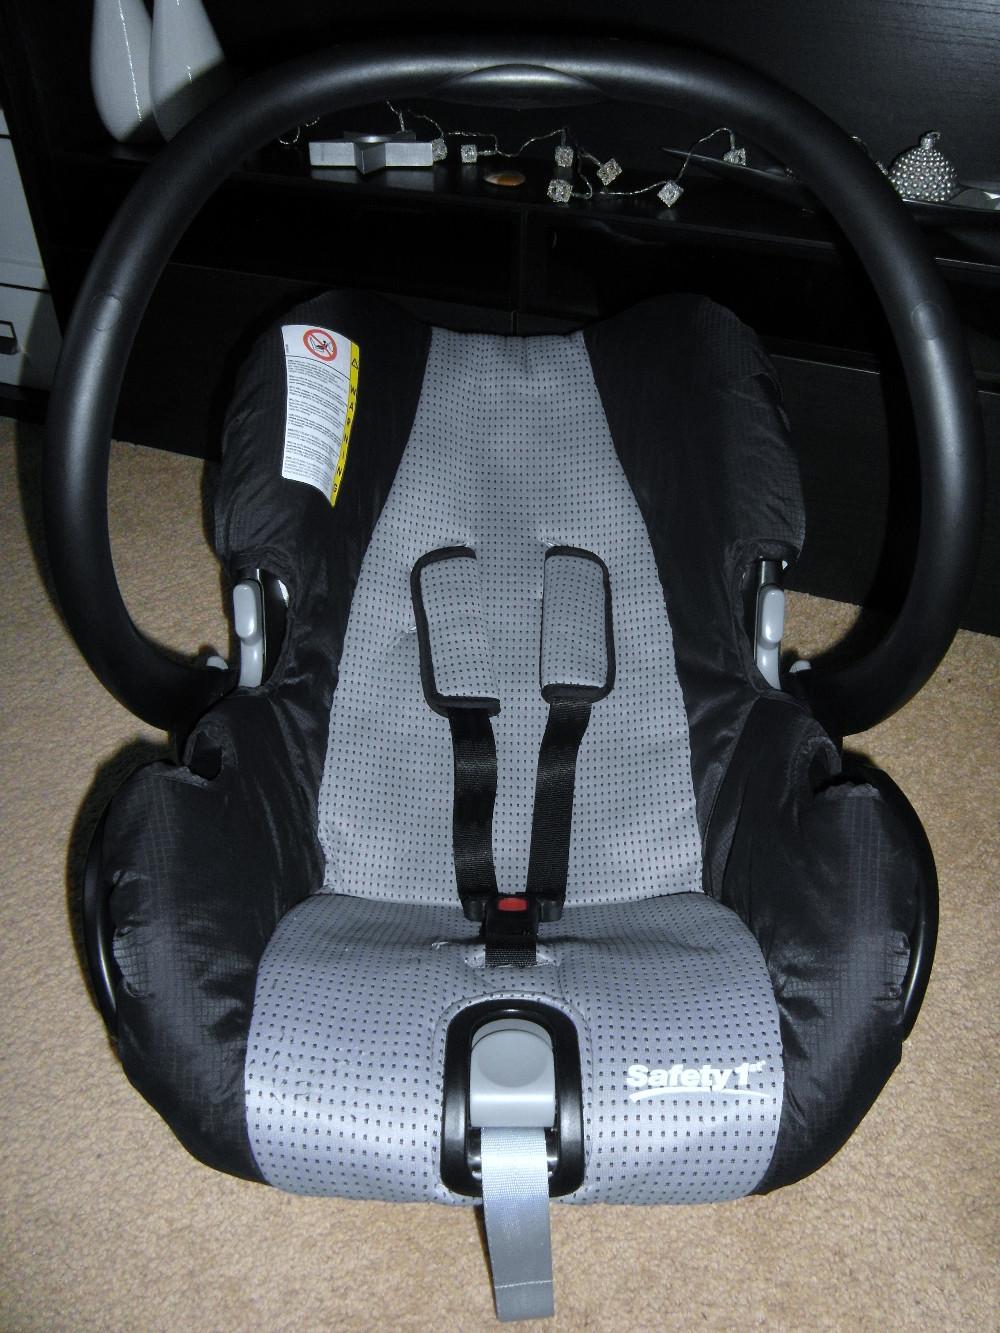 babyschale safety1st universal 0 13kg autositz wippe 835845. Black Bedroom Furniture Sets. Home Design Ideas